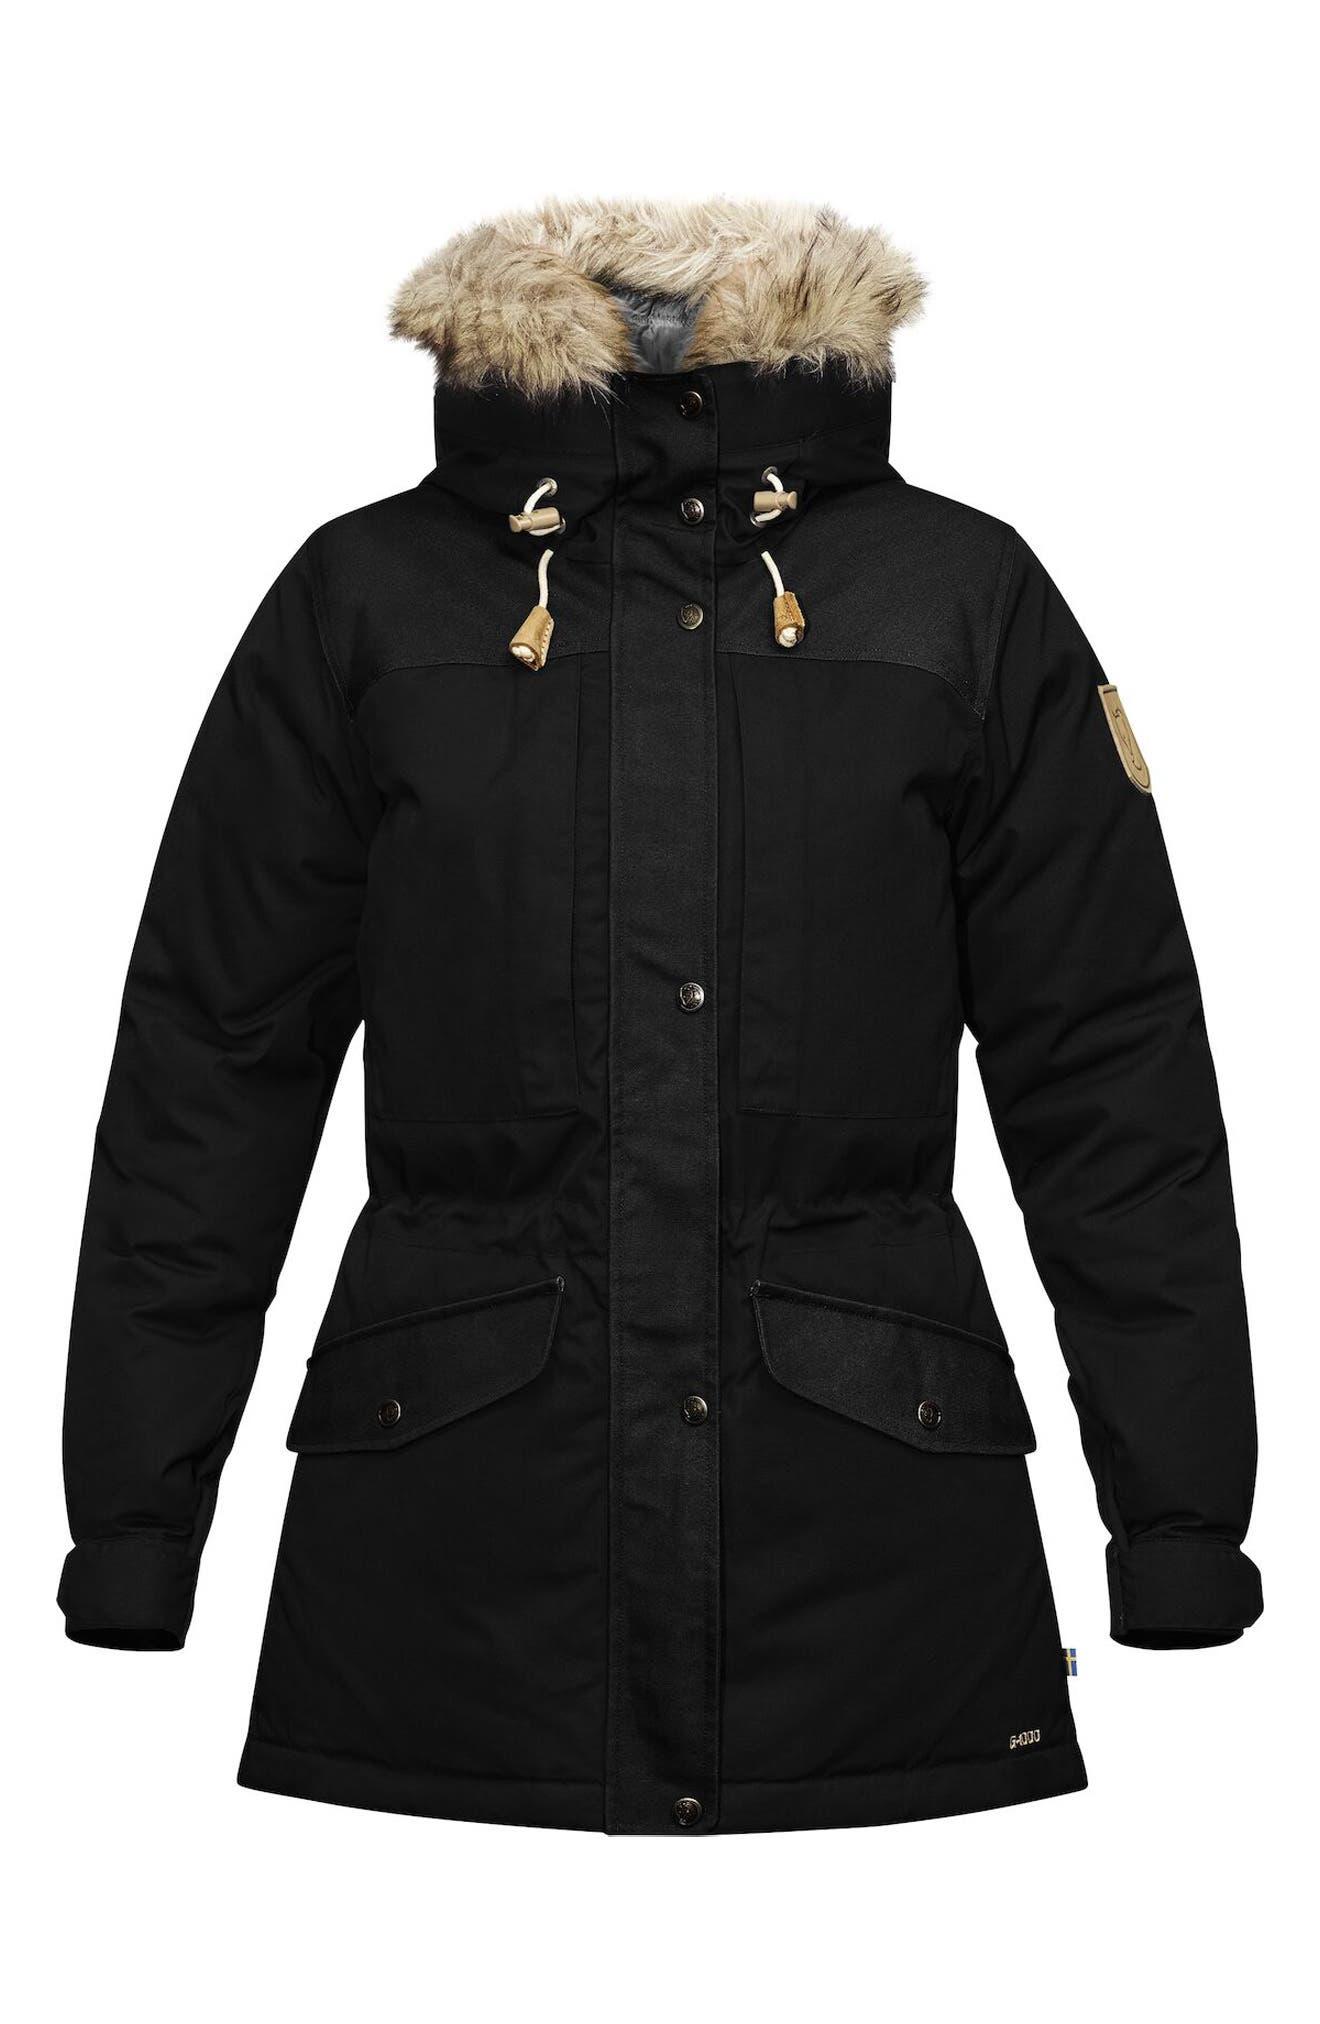 Singi 600 Fill Power Down Jacket With Faux Fur Trim